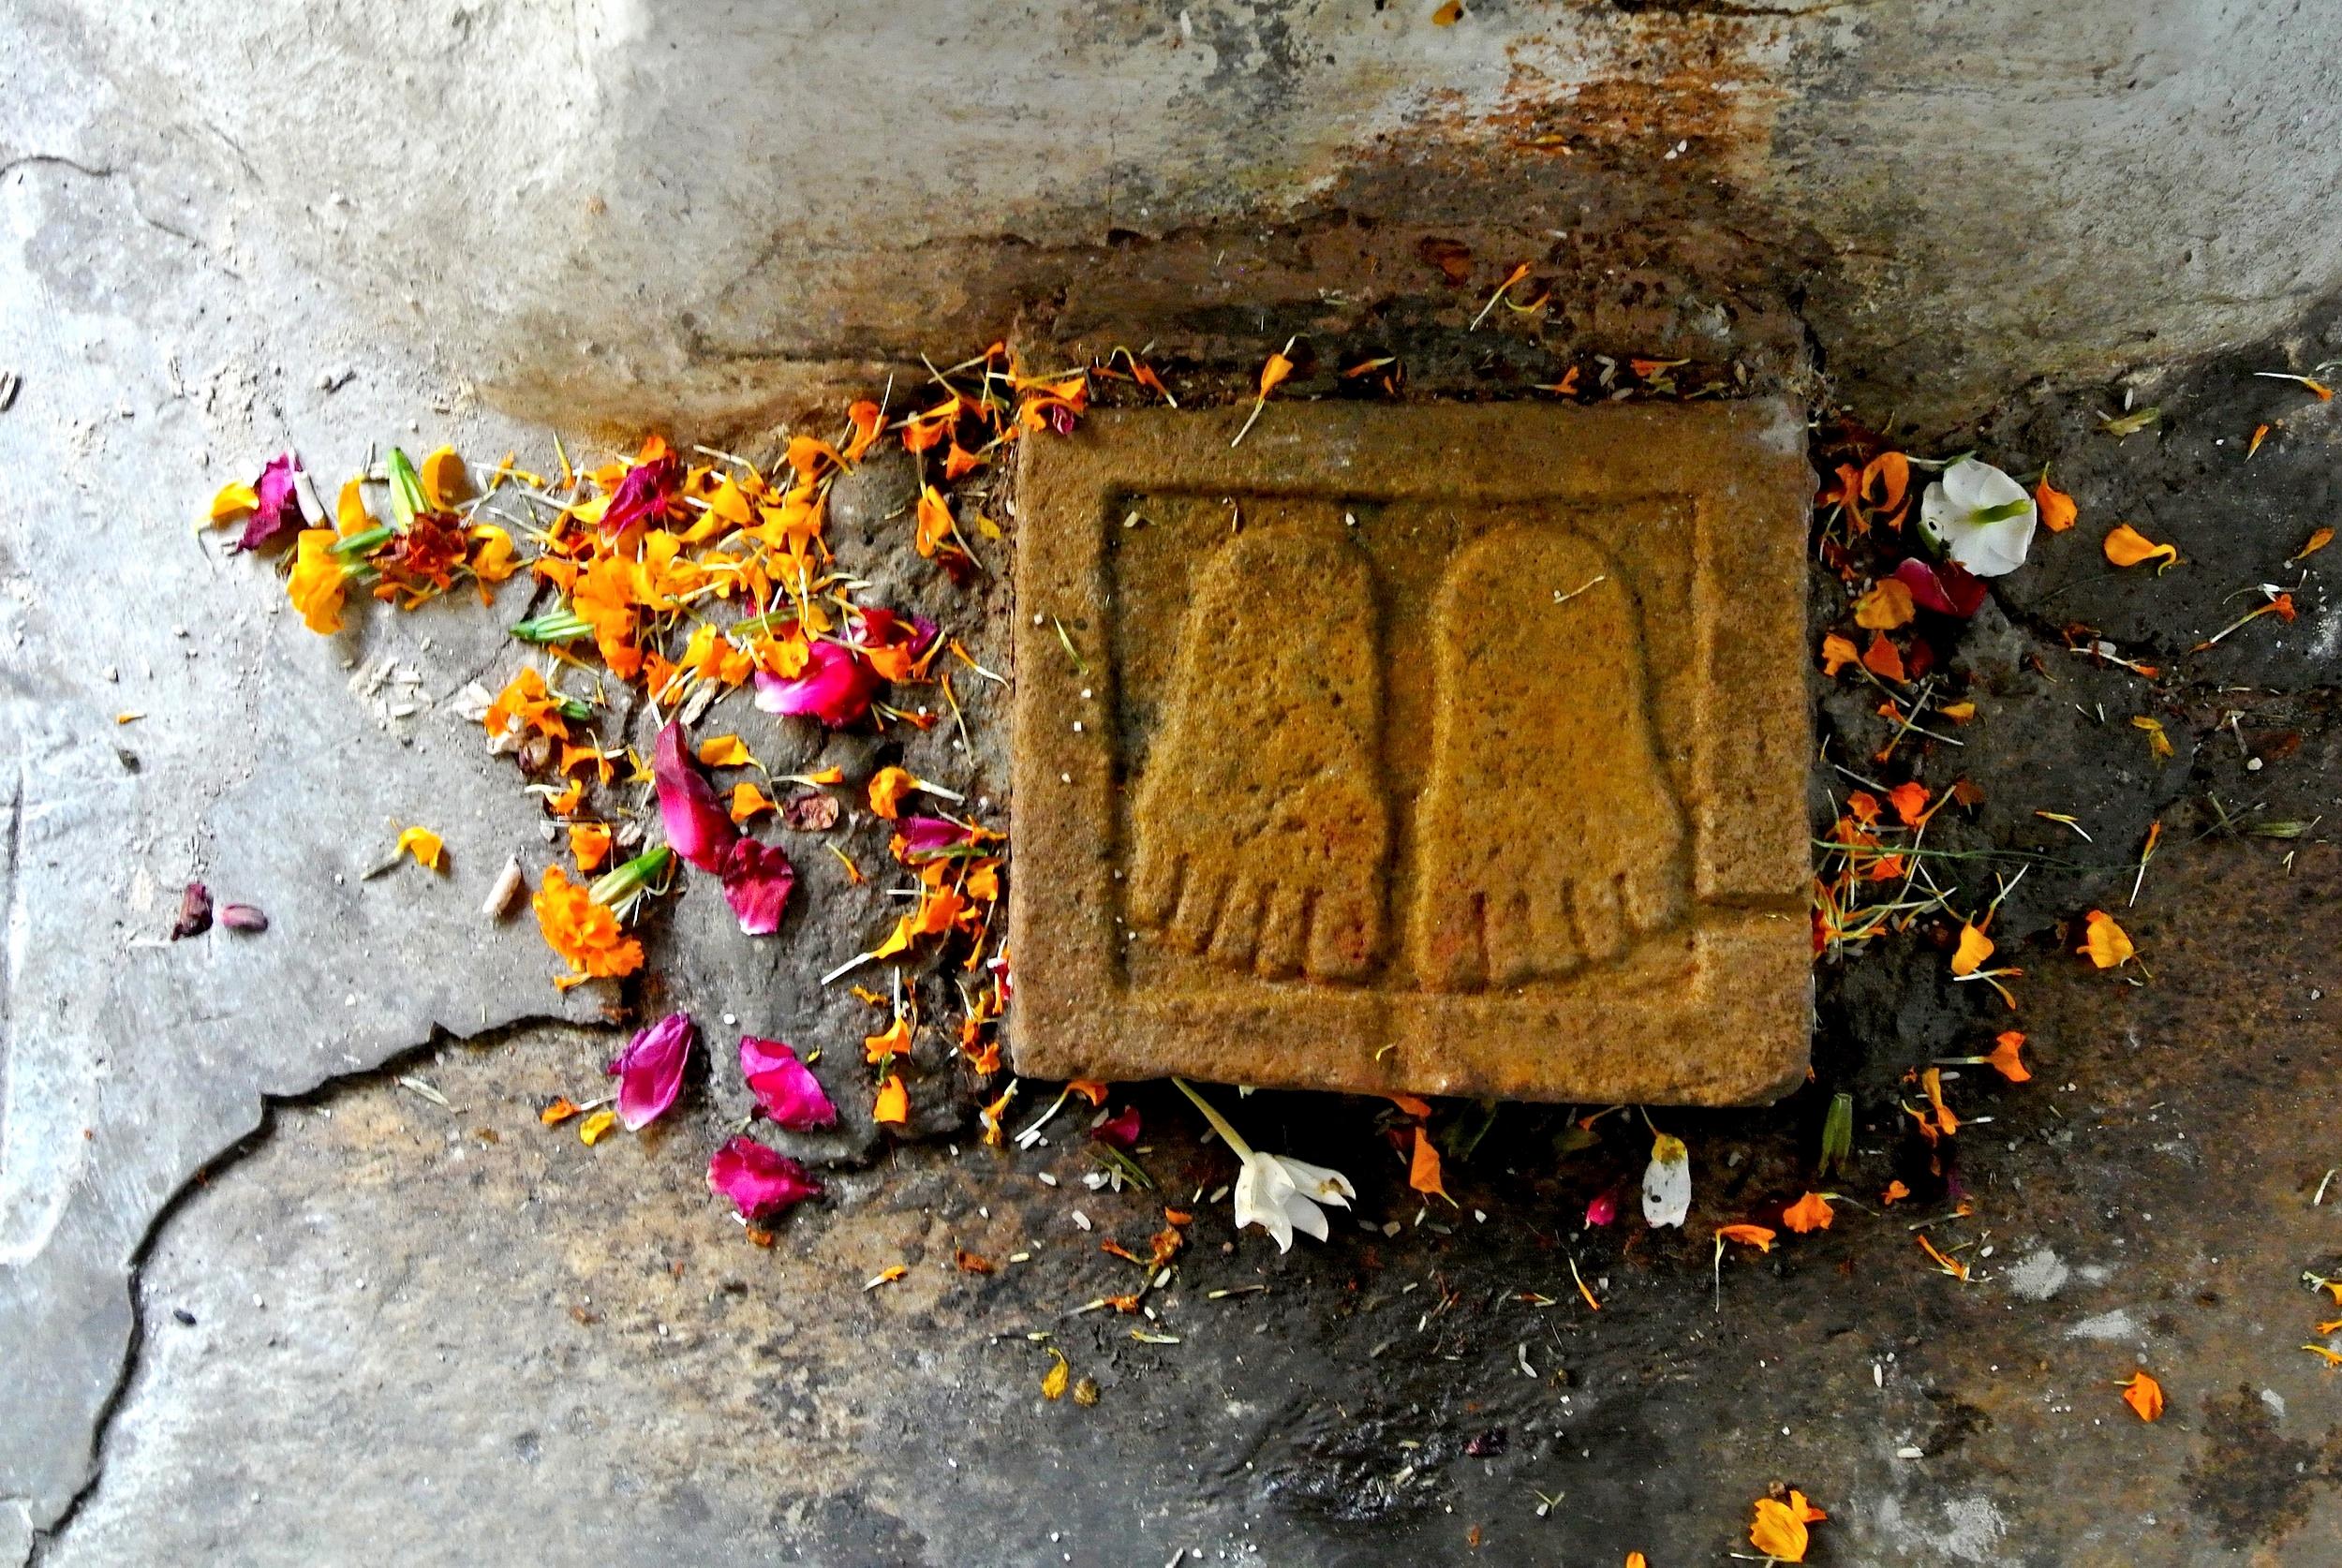 The Buddha's footprints at the Dhundiraj Ganpati Mandir Temple in Baroda, India